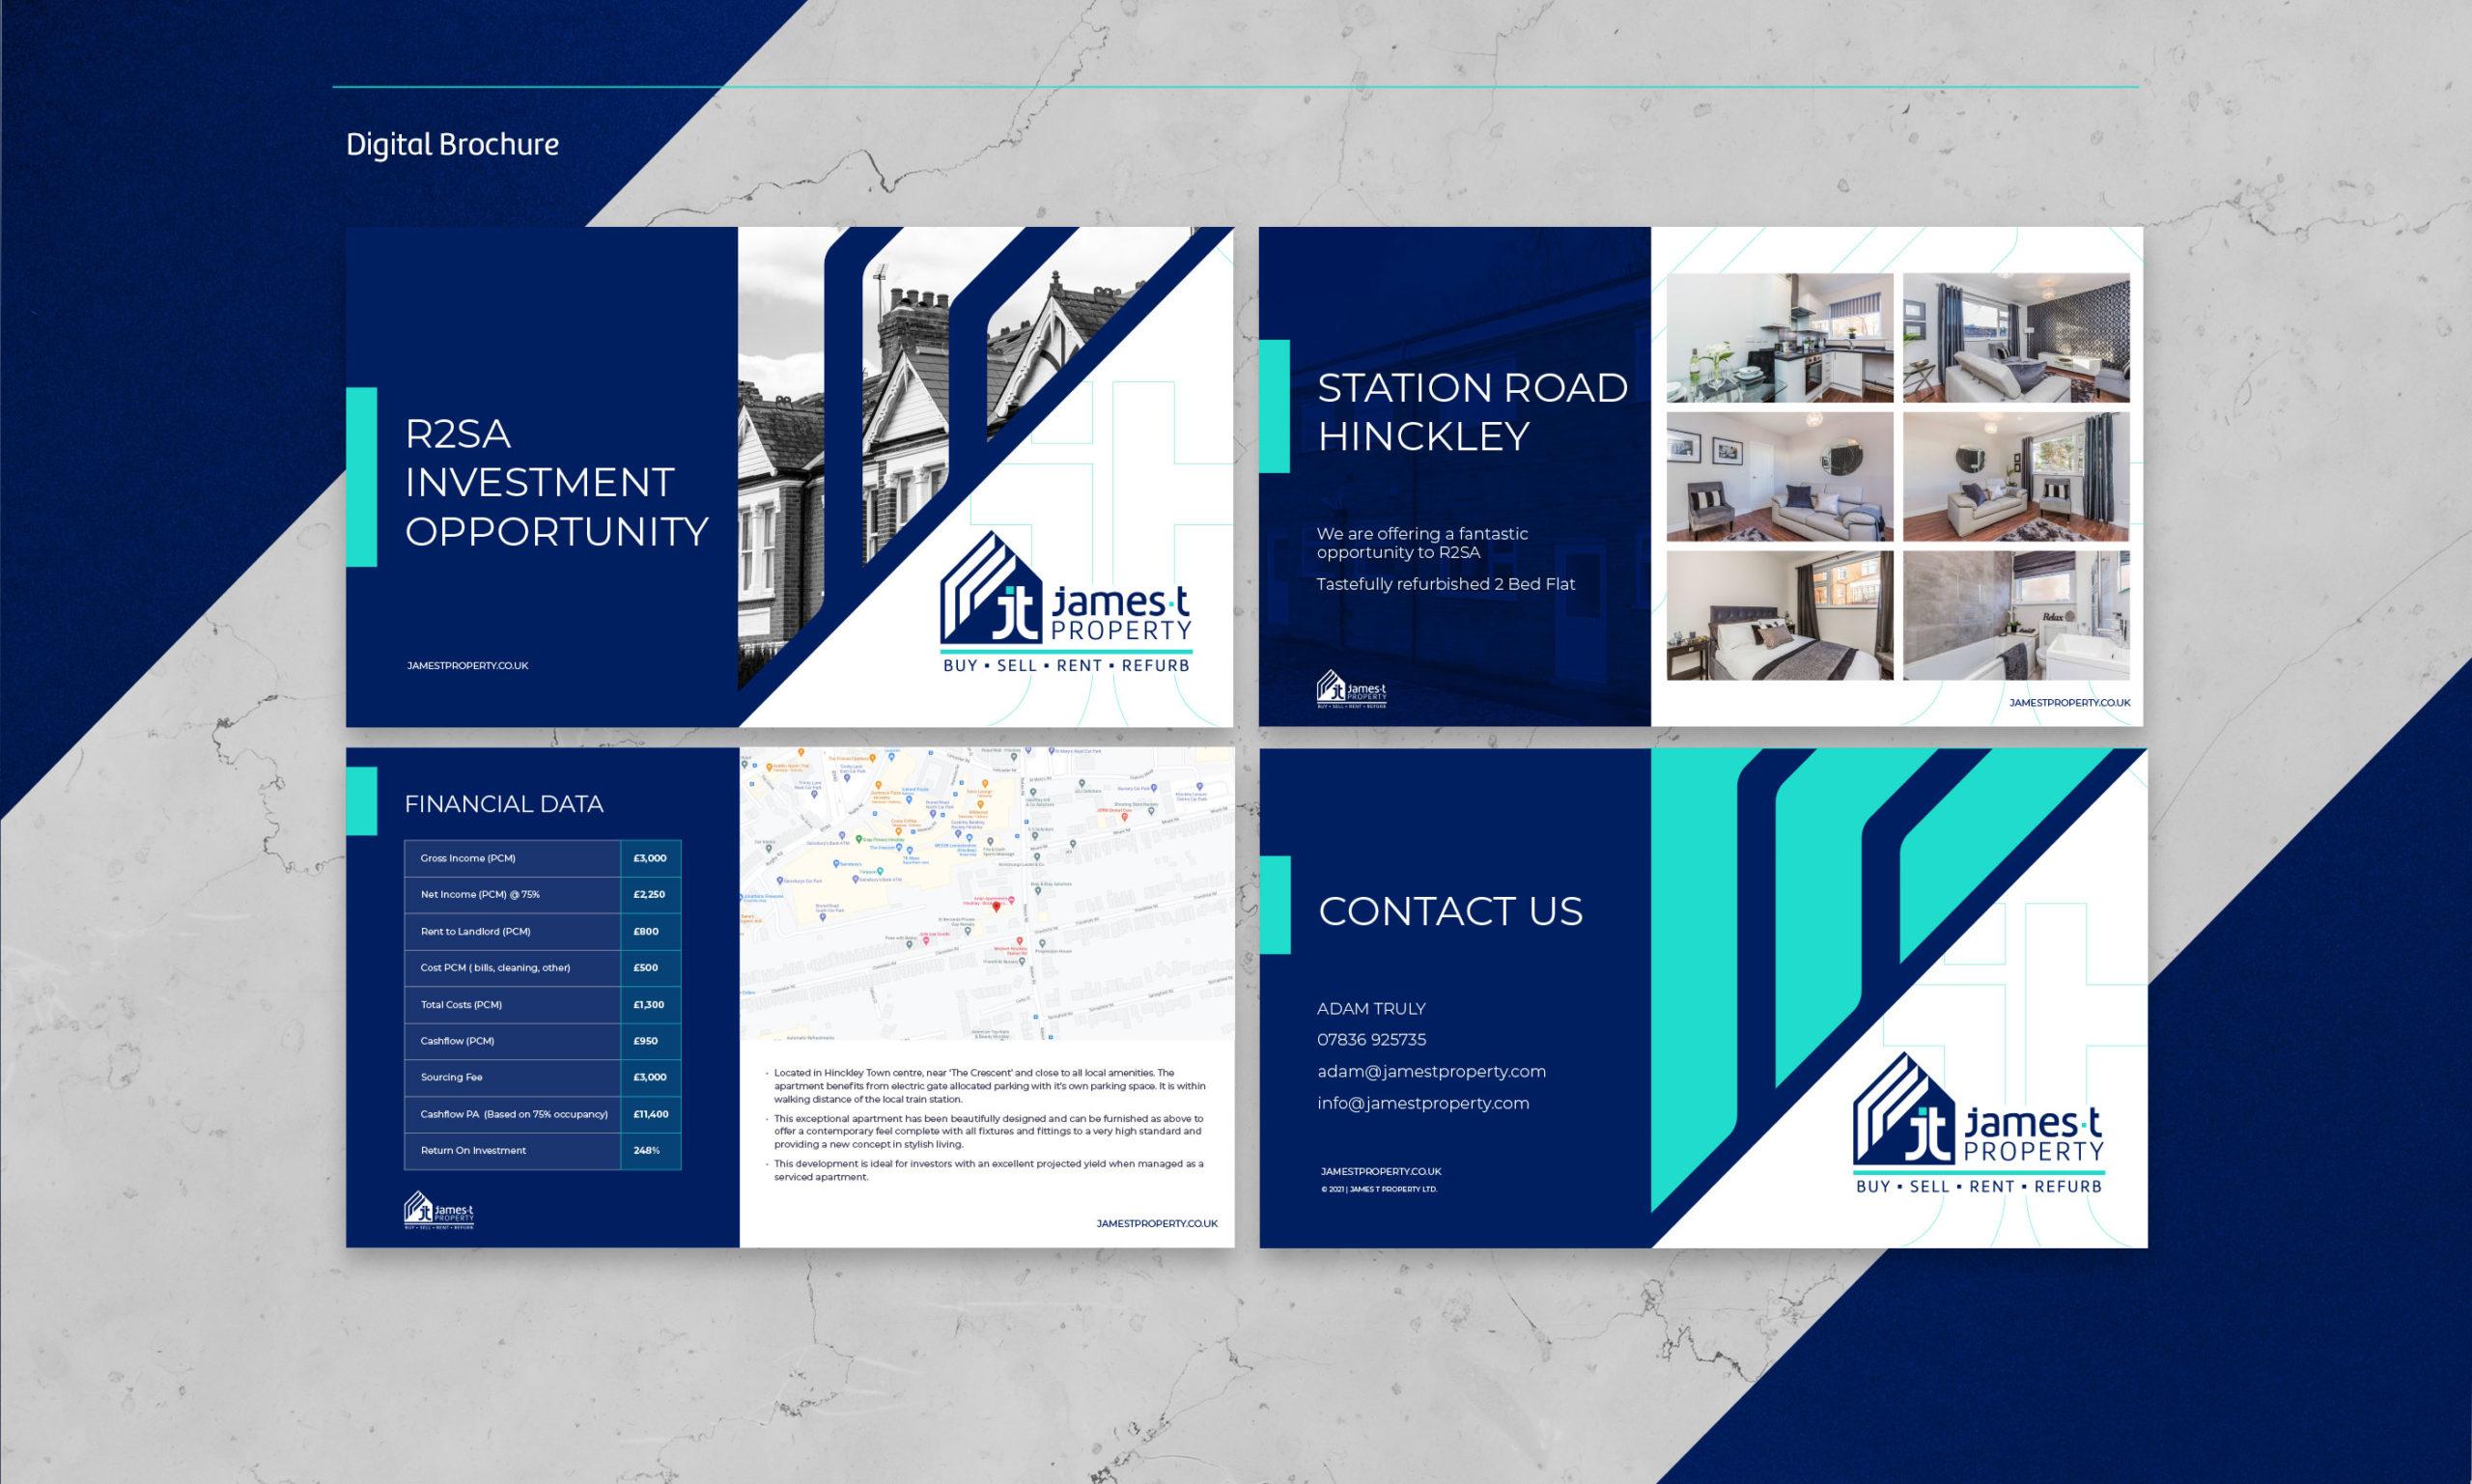 New digital brochure for James T Property - BONB Creative & Design